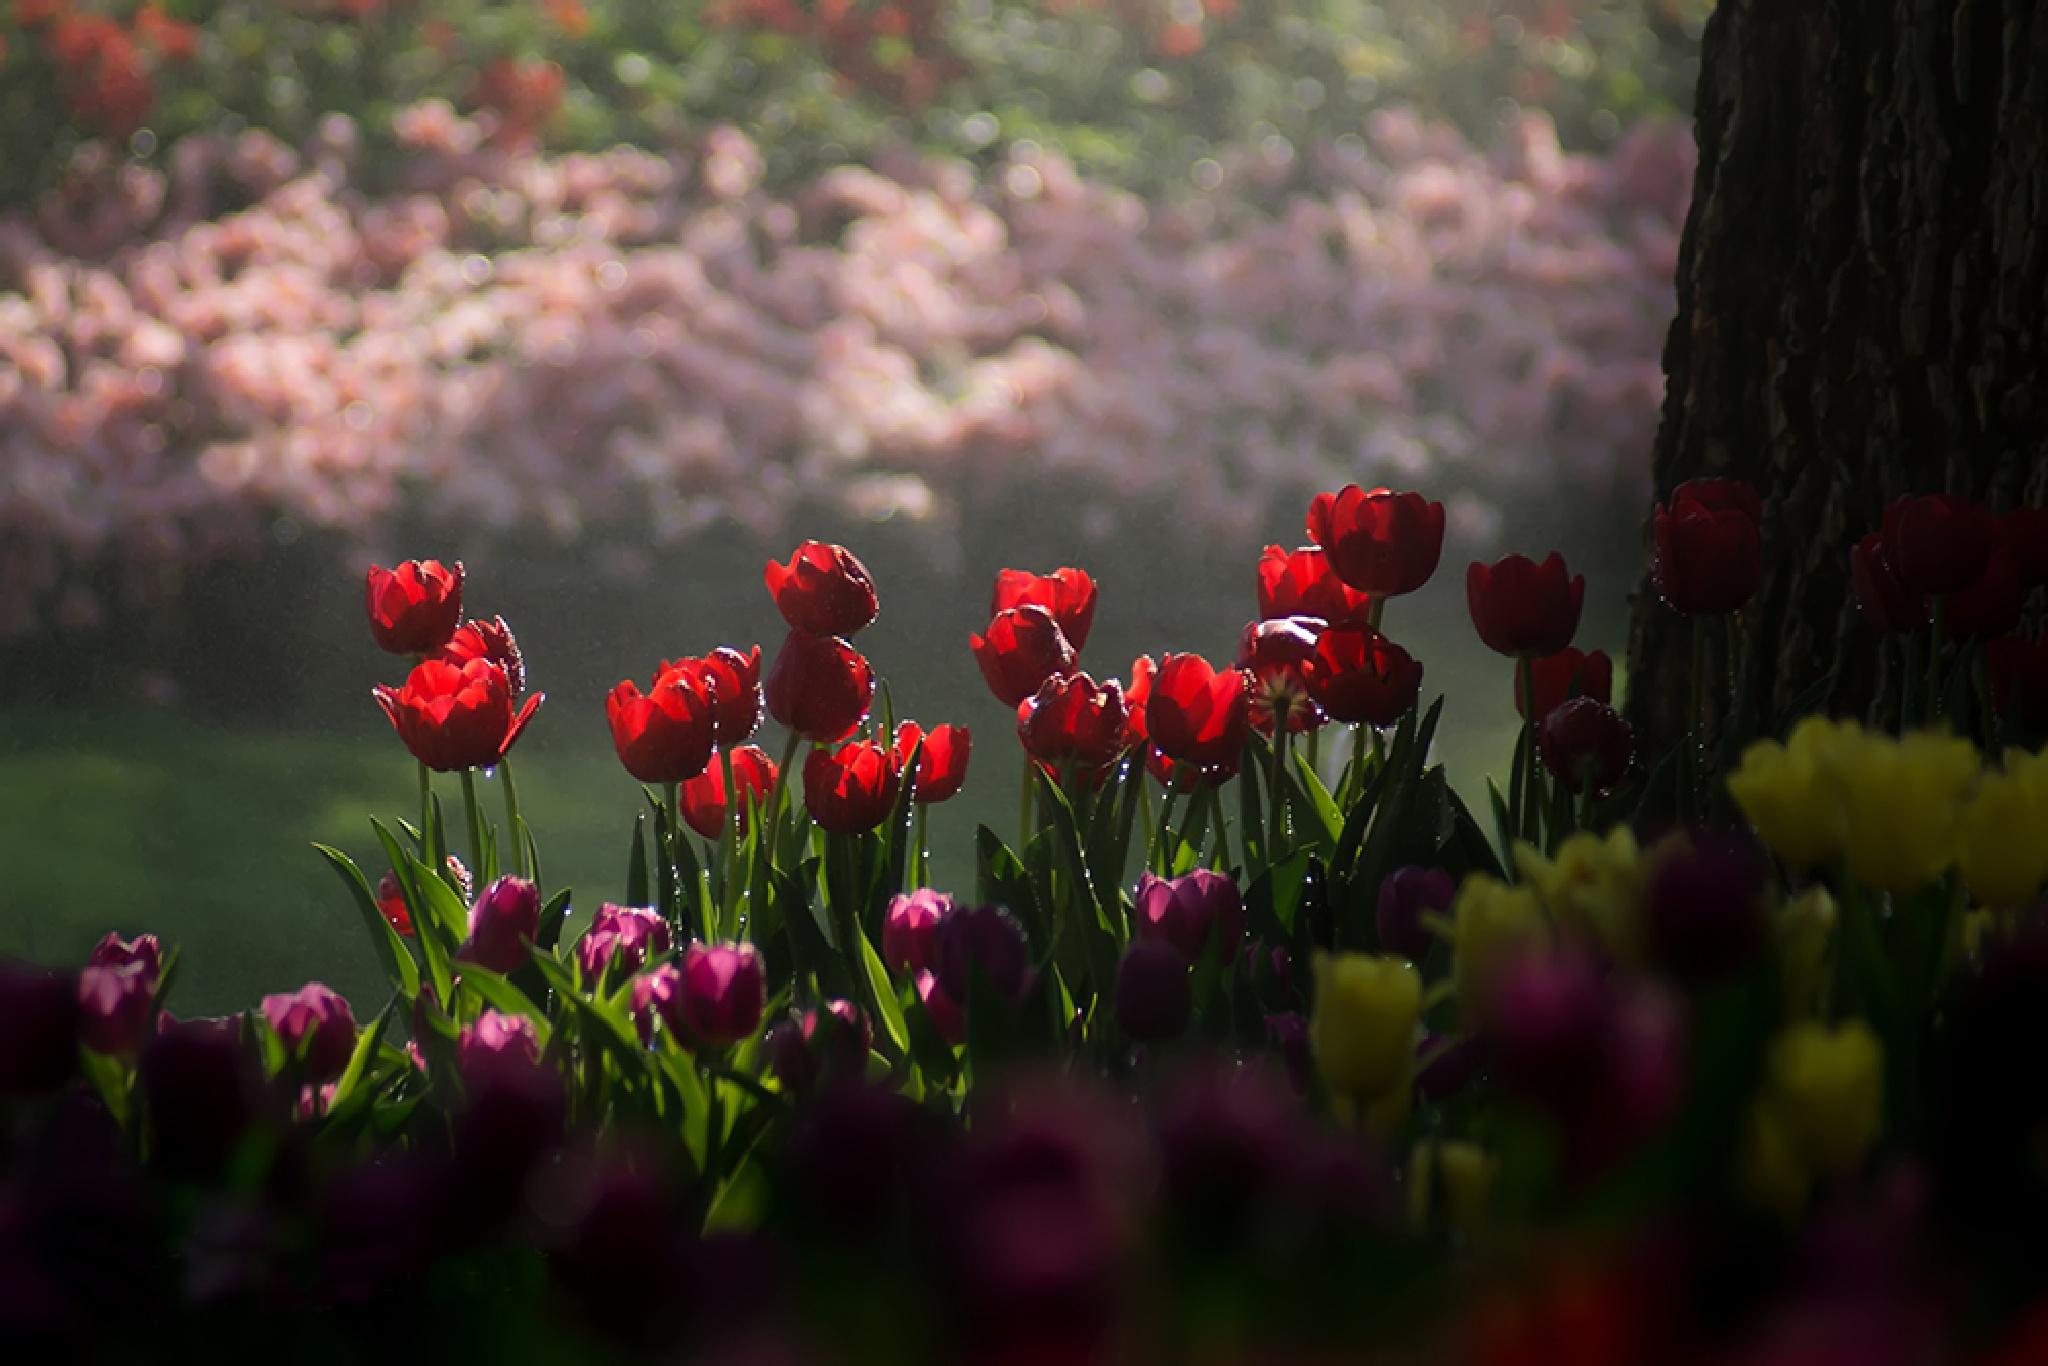 Tulips in the garden by hpk2652